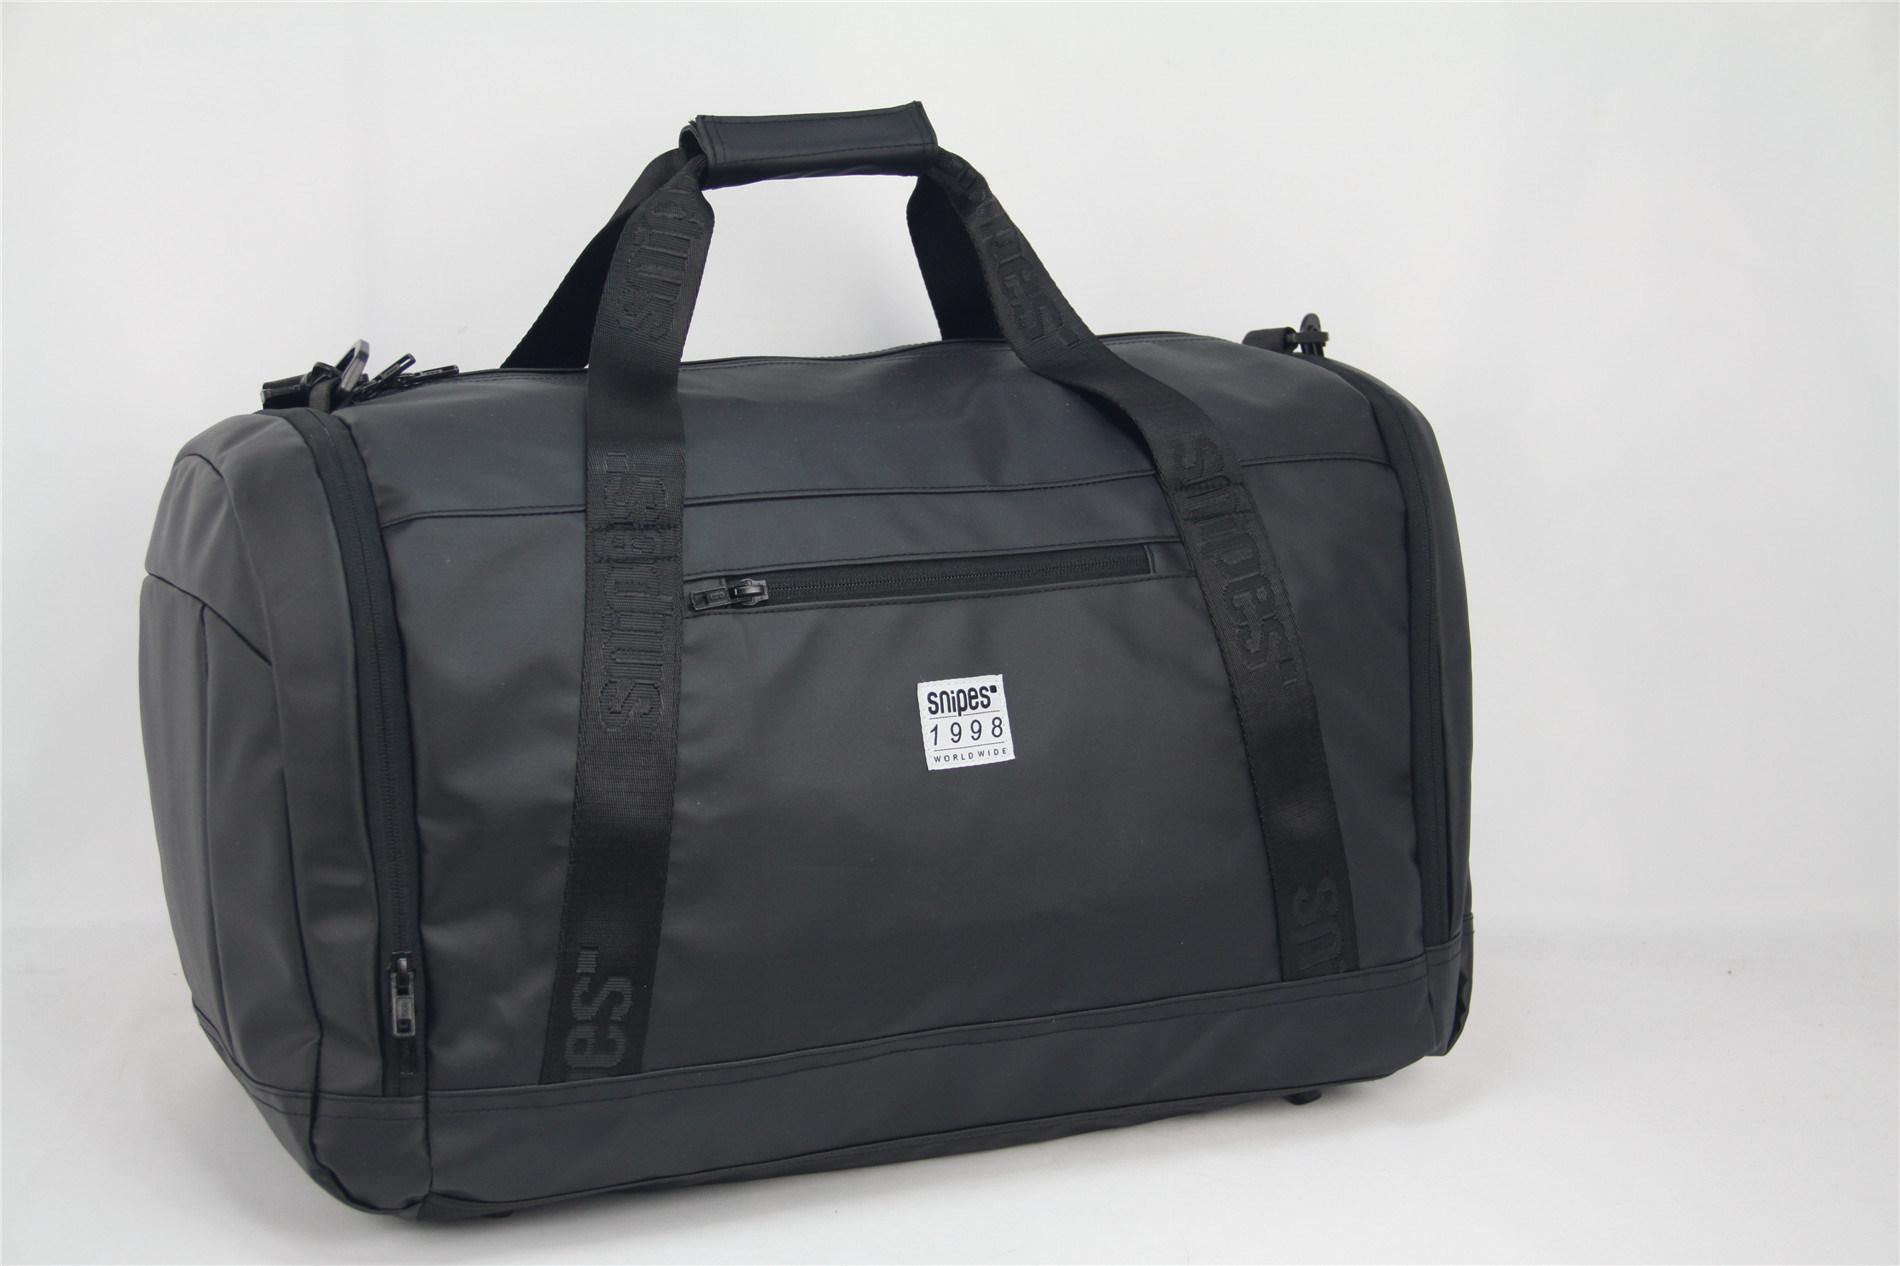 Hot Item Waterproof Duffle Bag Handbag For Gym And Outdoor